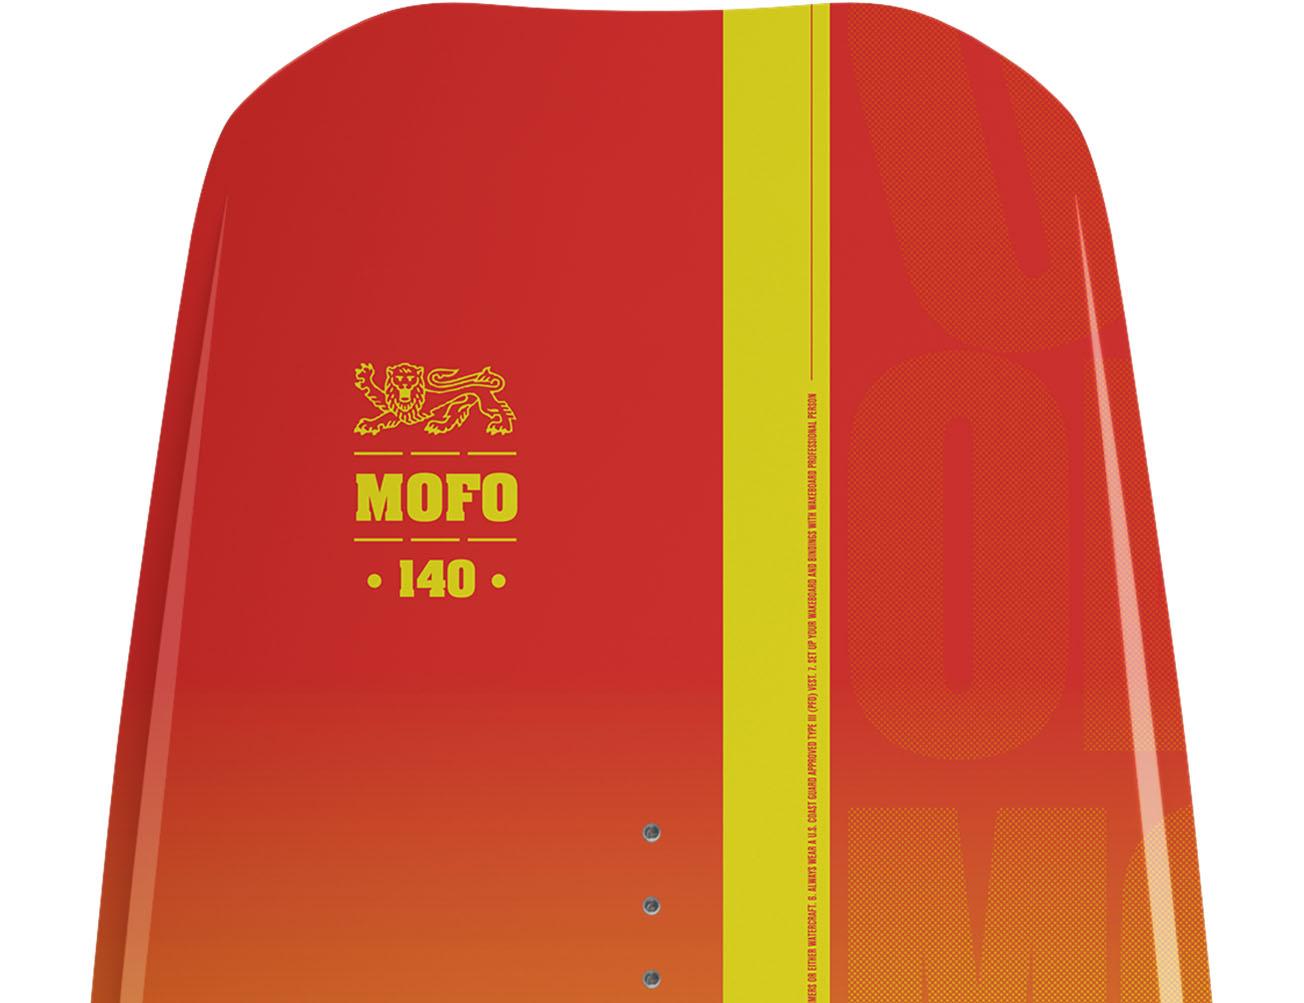 www.mofo.com